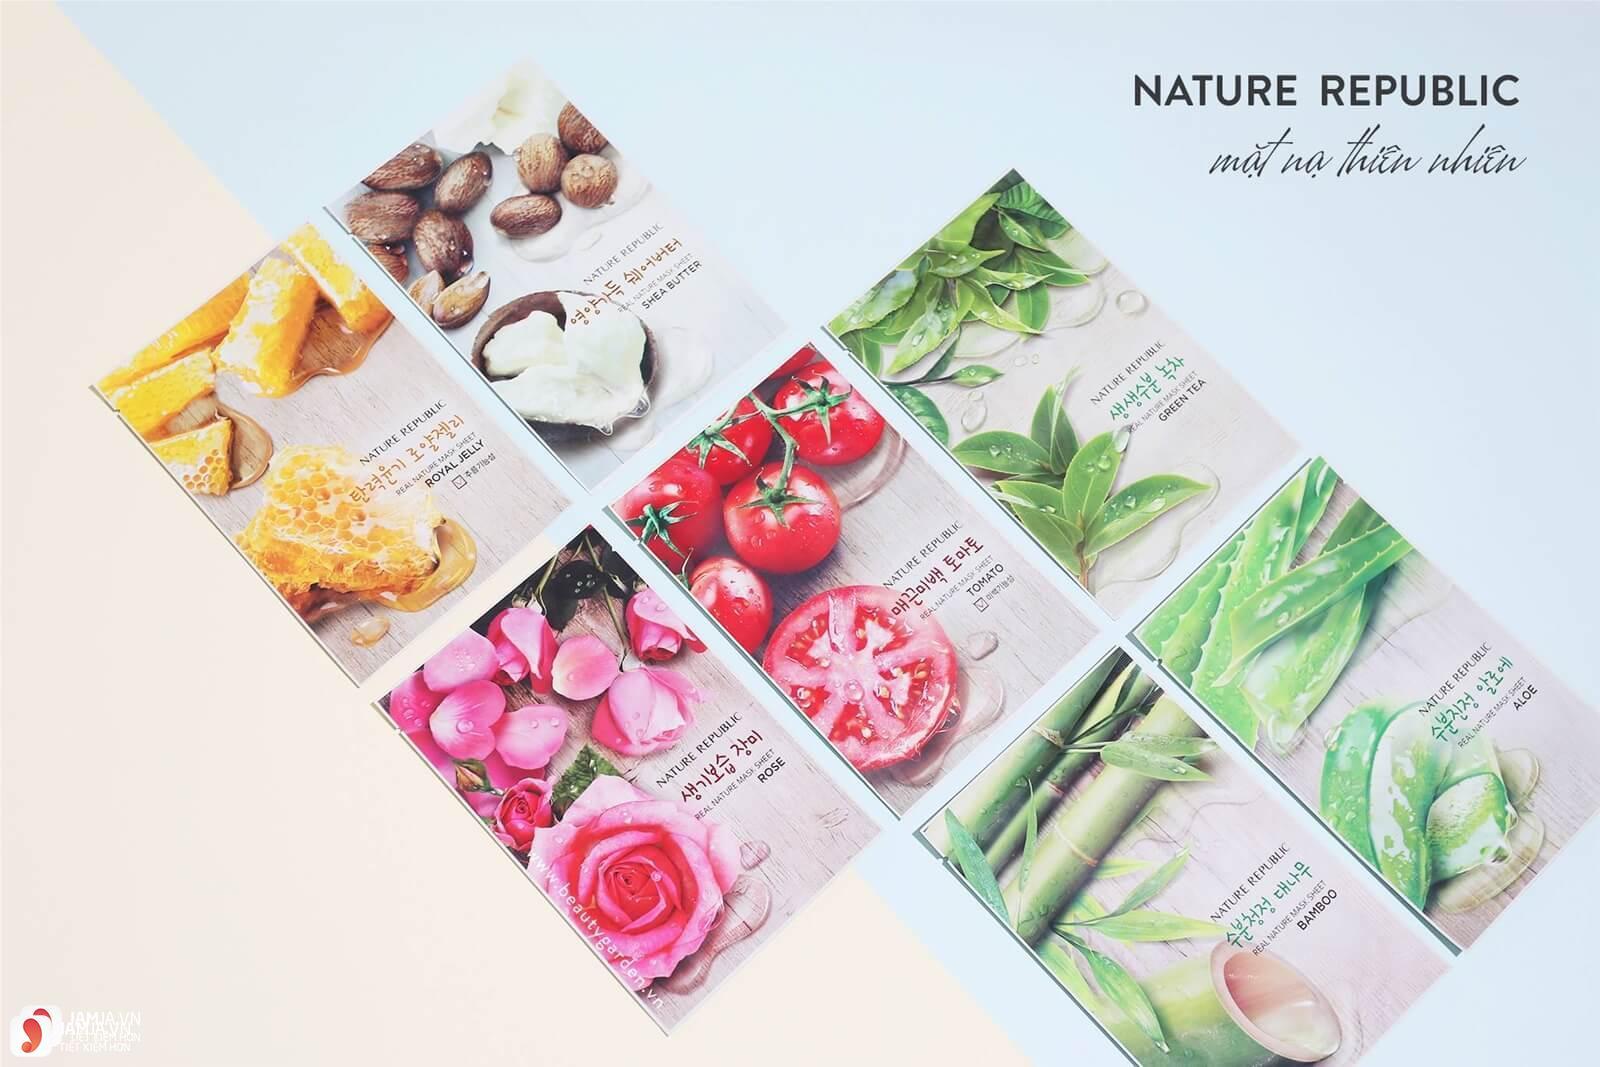 Mặt nạ giấy Nature Republic Real Nature Mask Sheet giá bao nhiêu